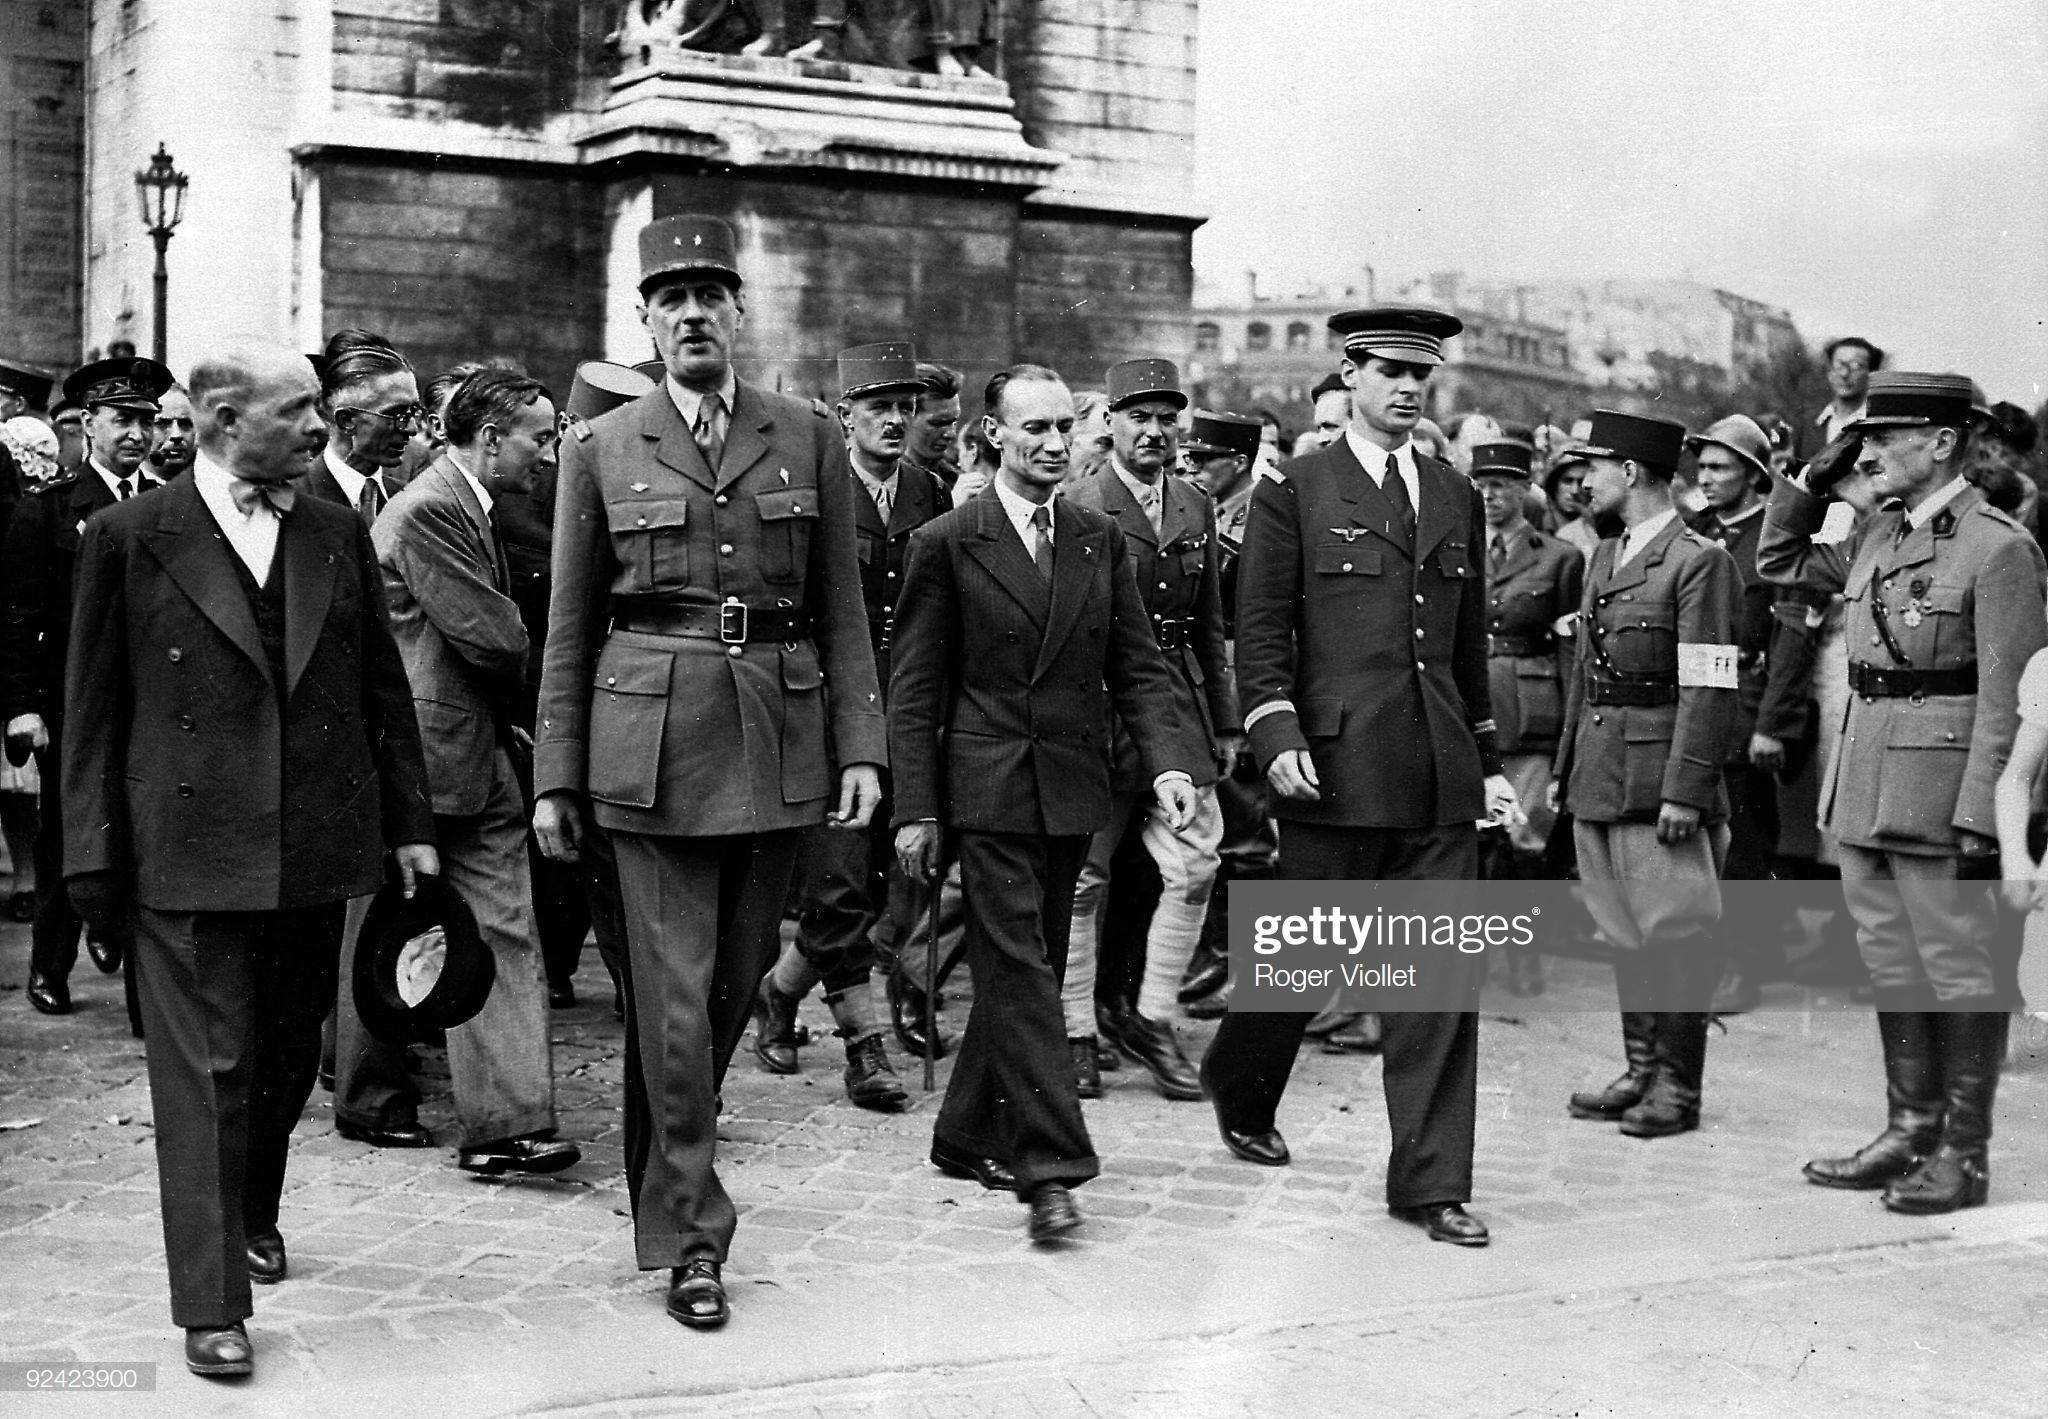 Аржанлье и де голль 26 08 1944.jpg